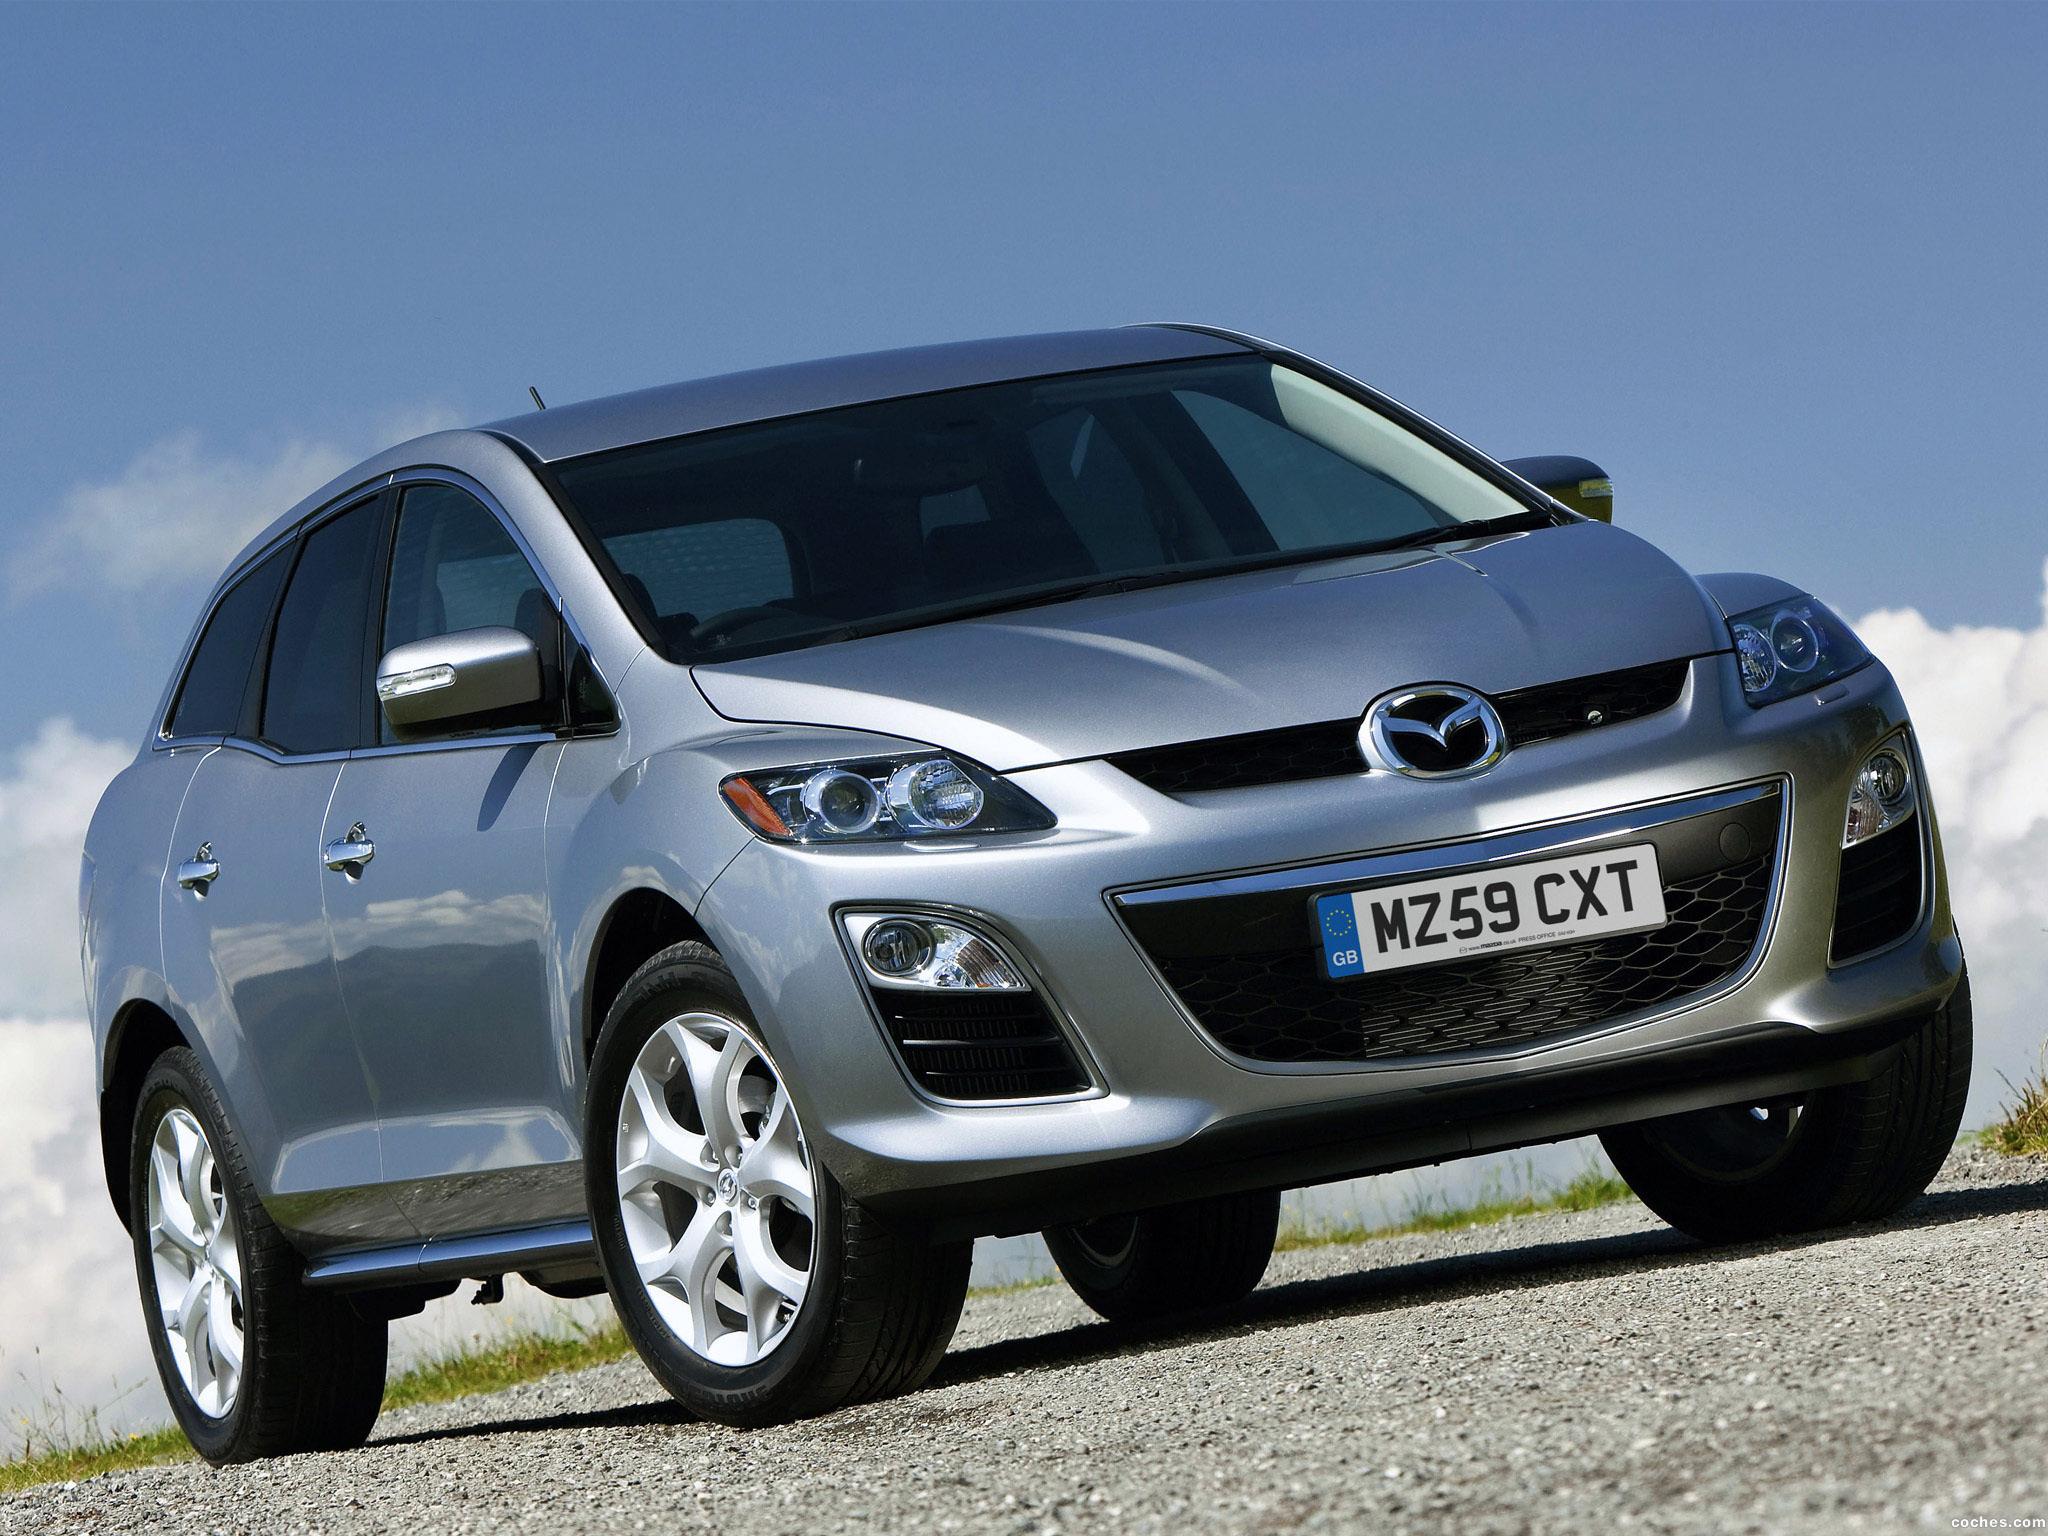 Foto 0 de Mazda CX-7 UK 2009